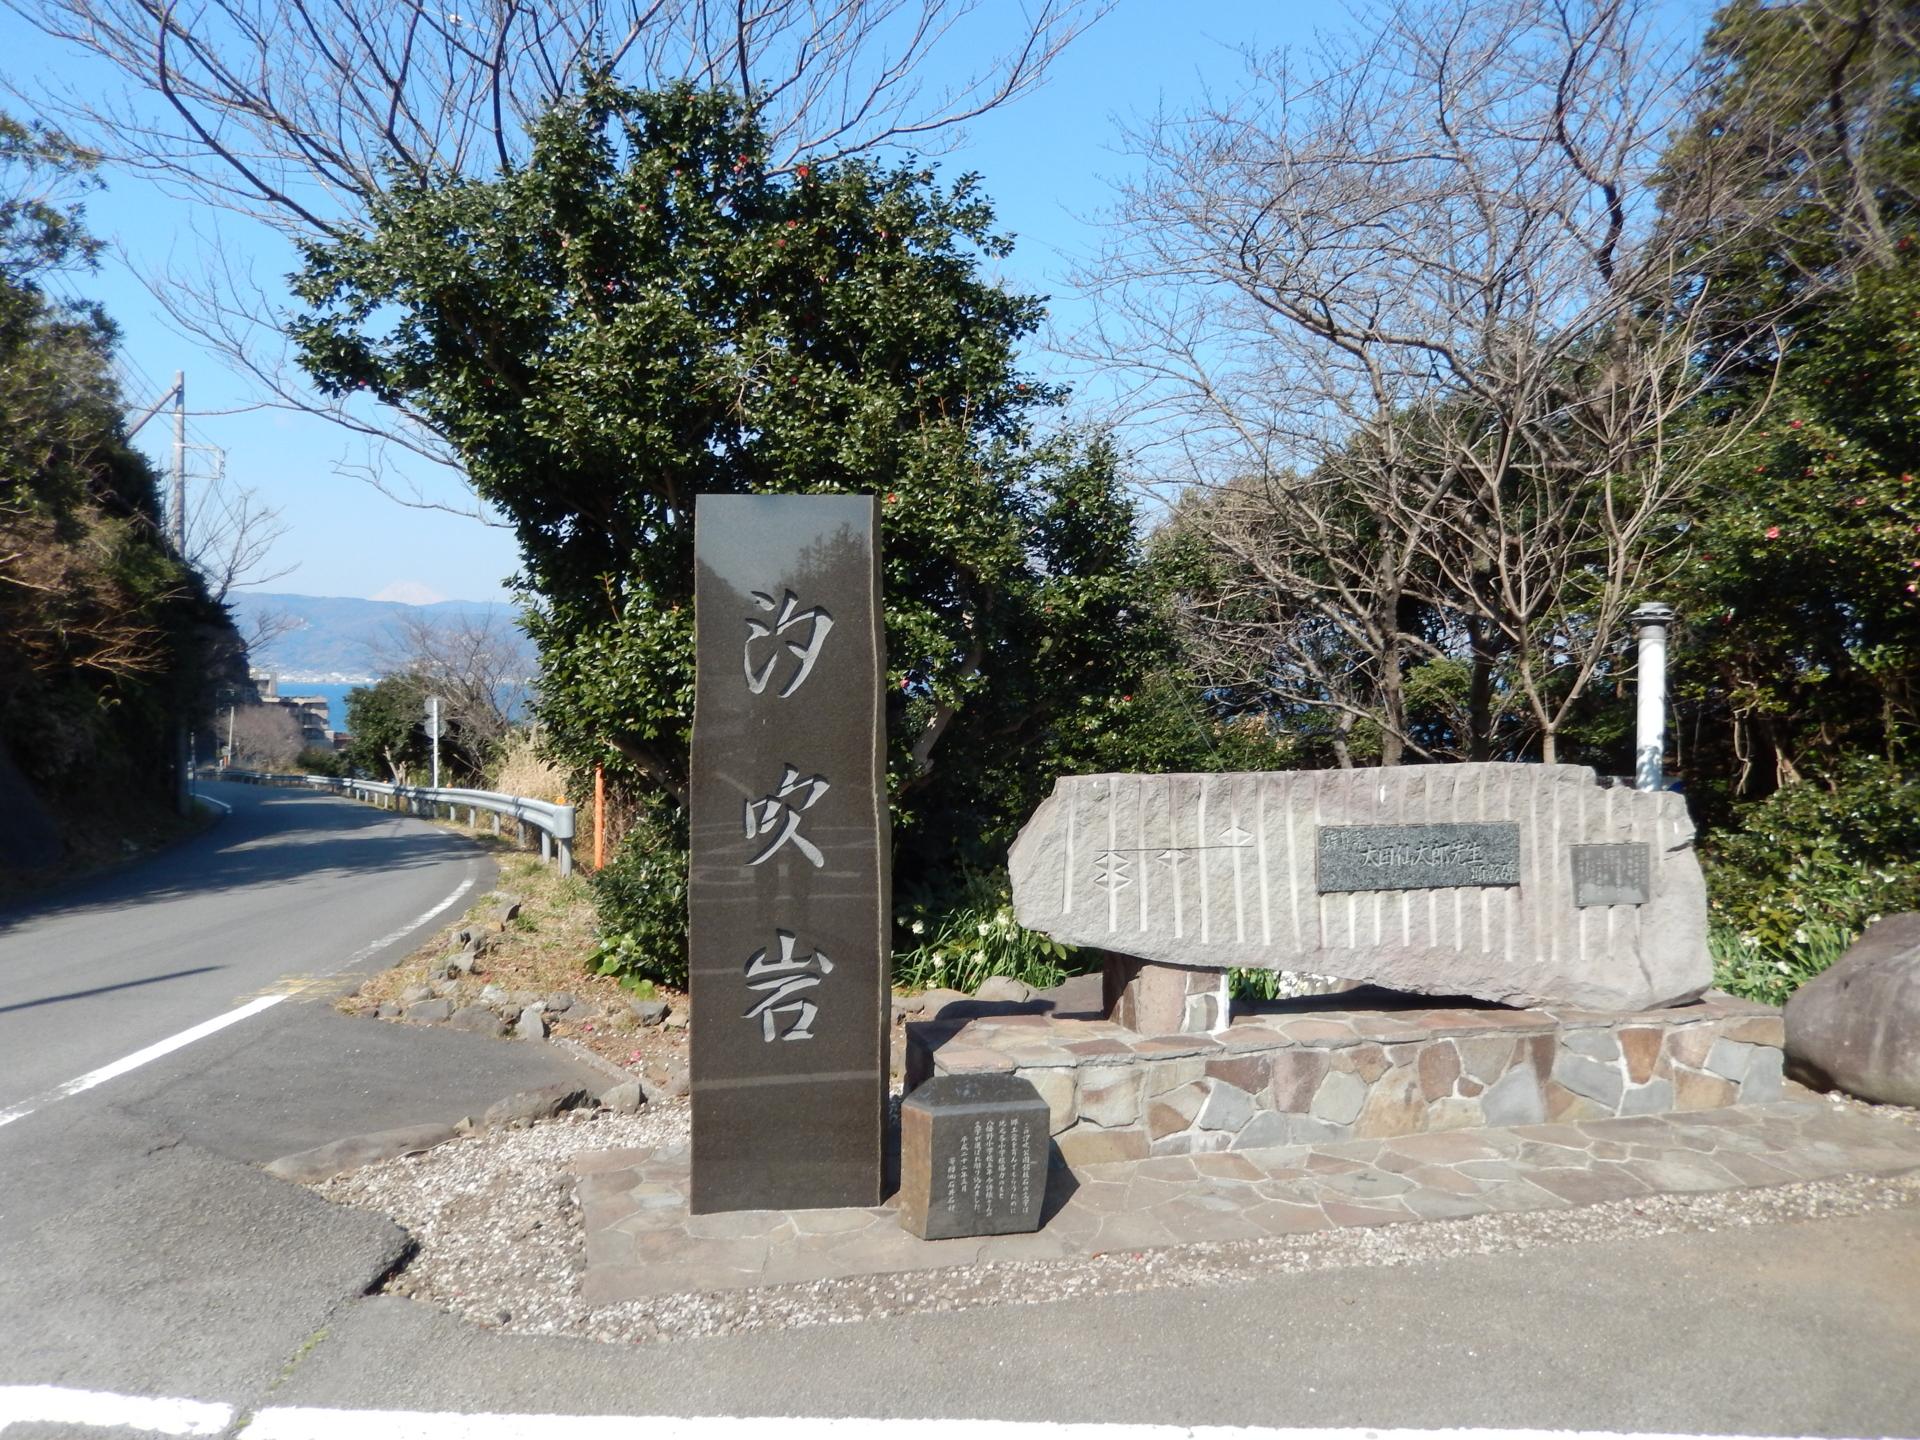 f:id:ToshUeno:20150215115627j:plain